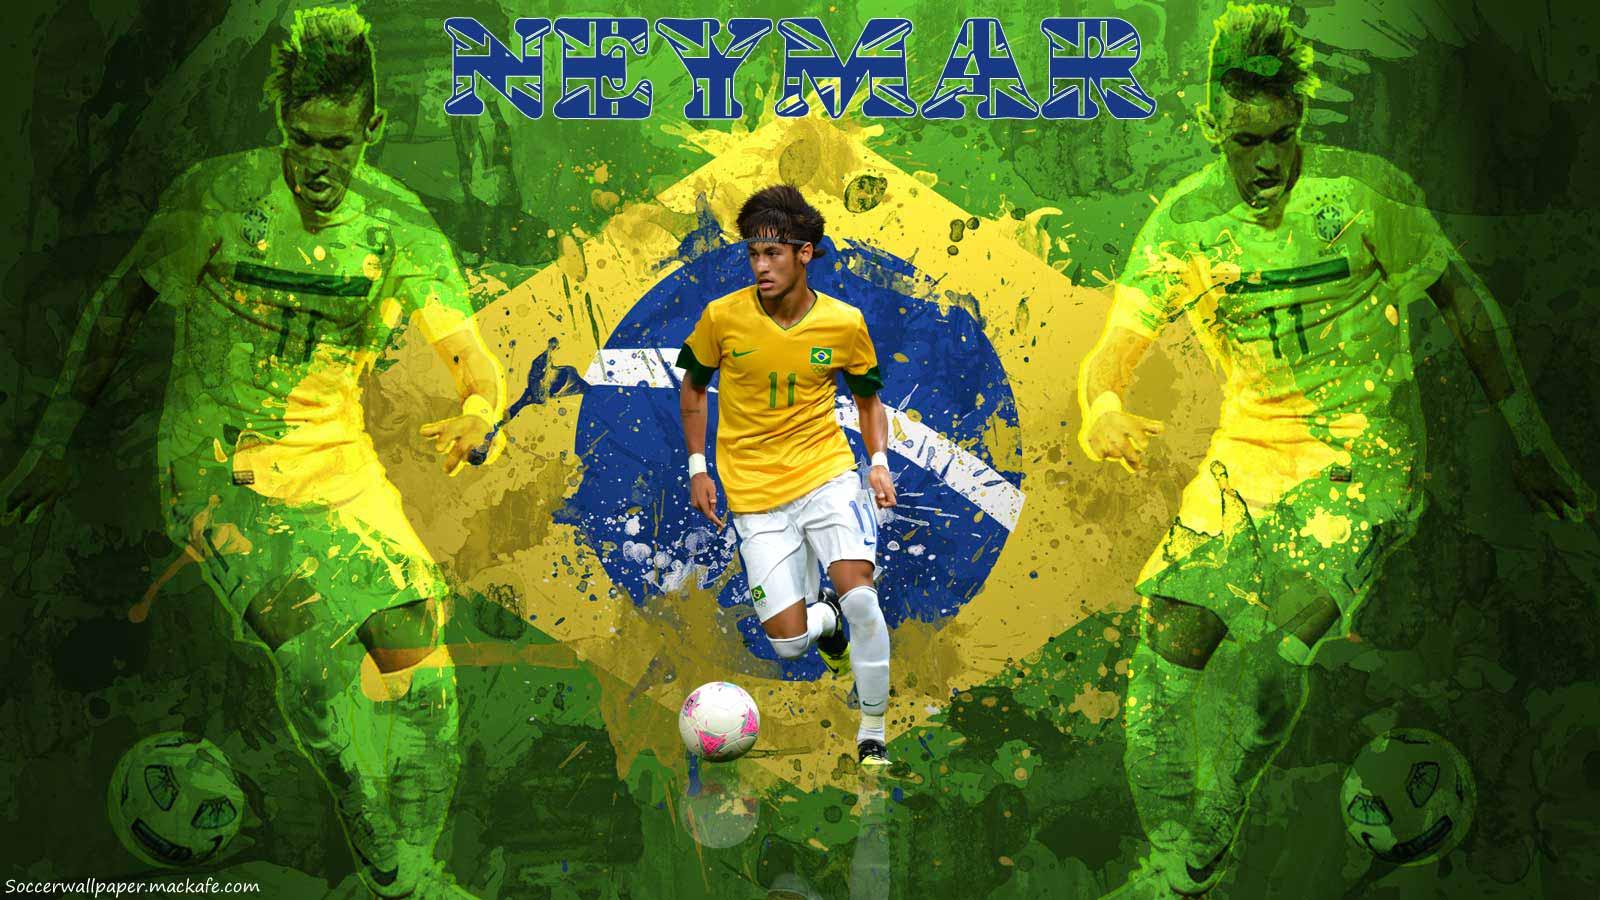 Neymar Brazil 2013 Wallpaper 1600x900